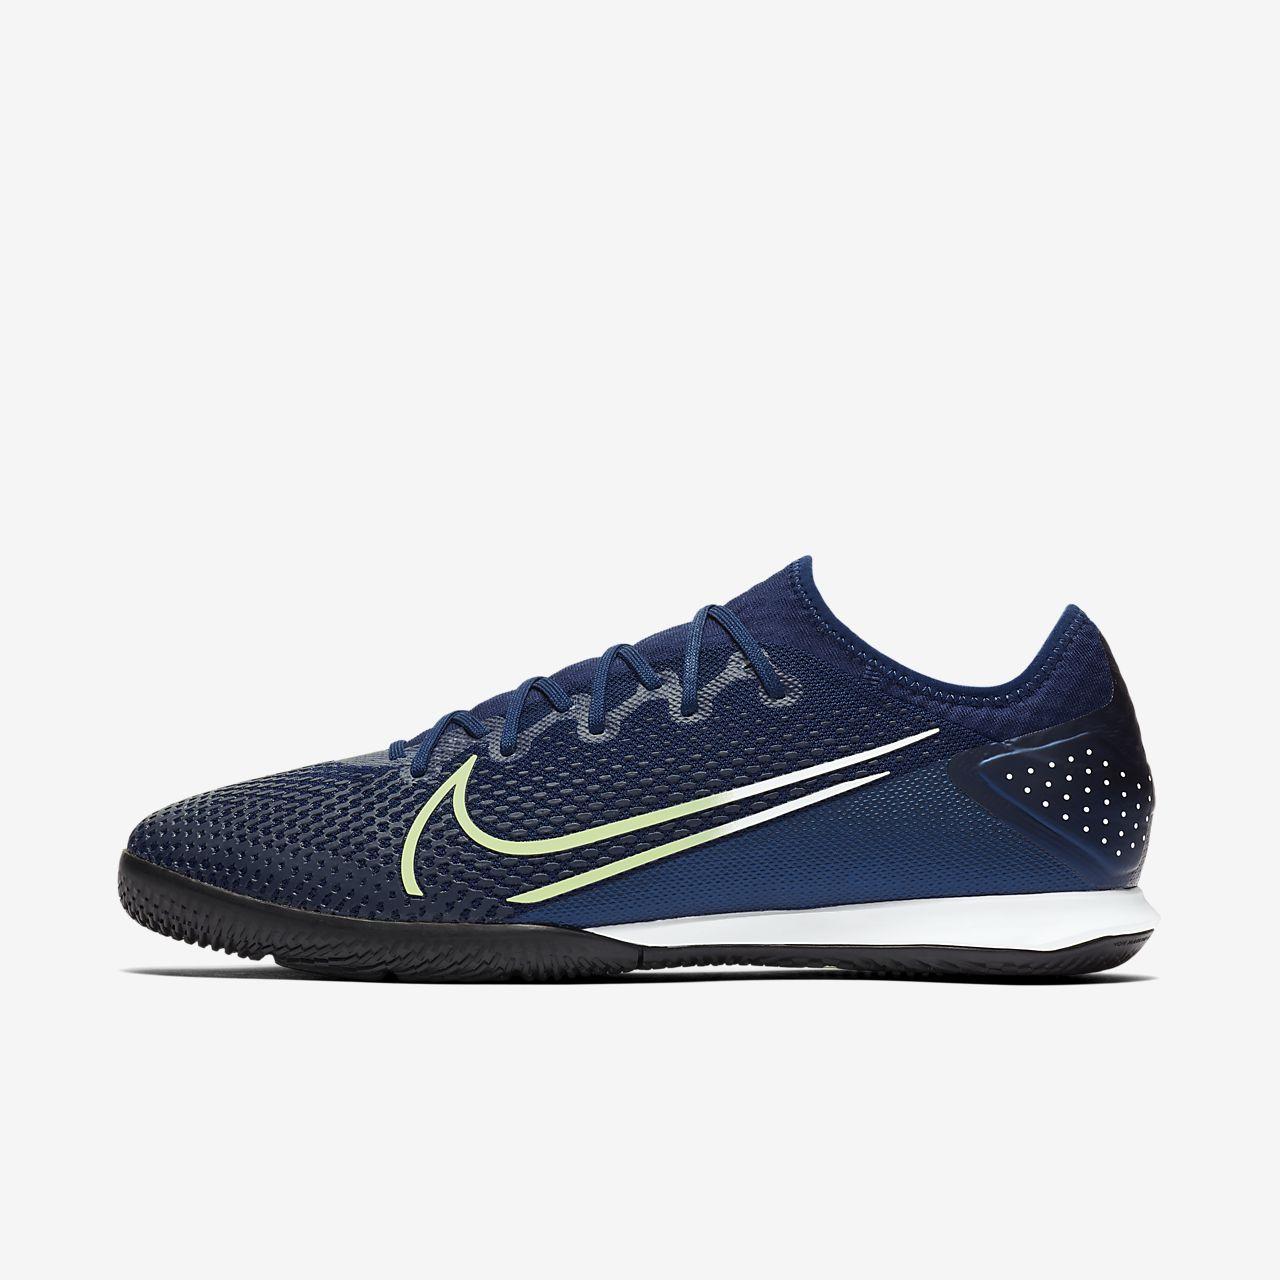 Nike Mercurial Vapor 13 Pro MDS IC Botas de fútbol sala